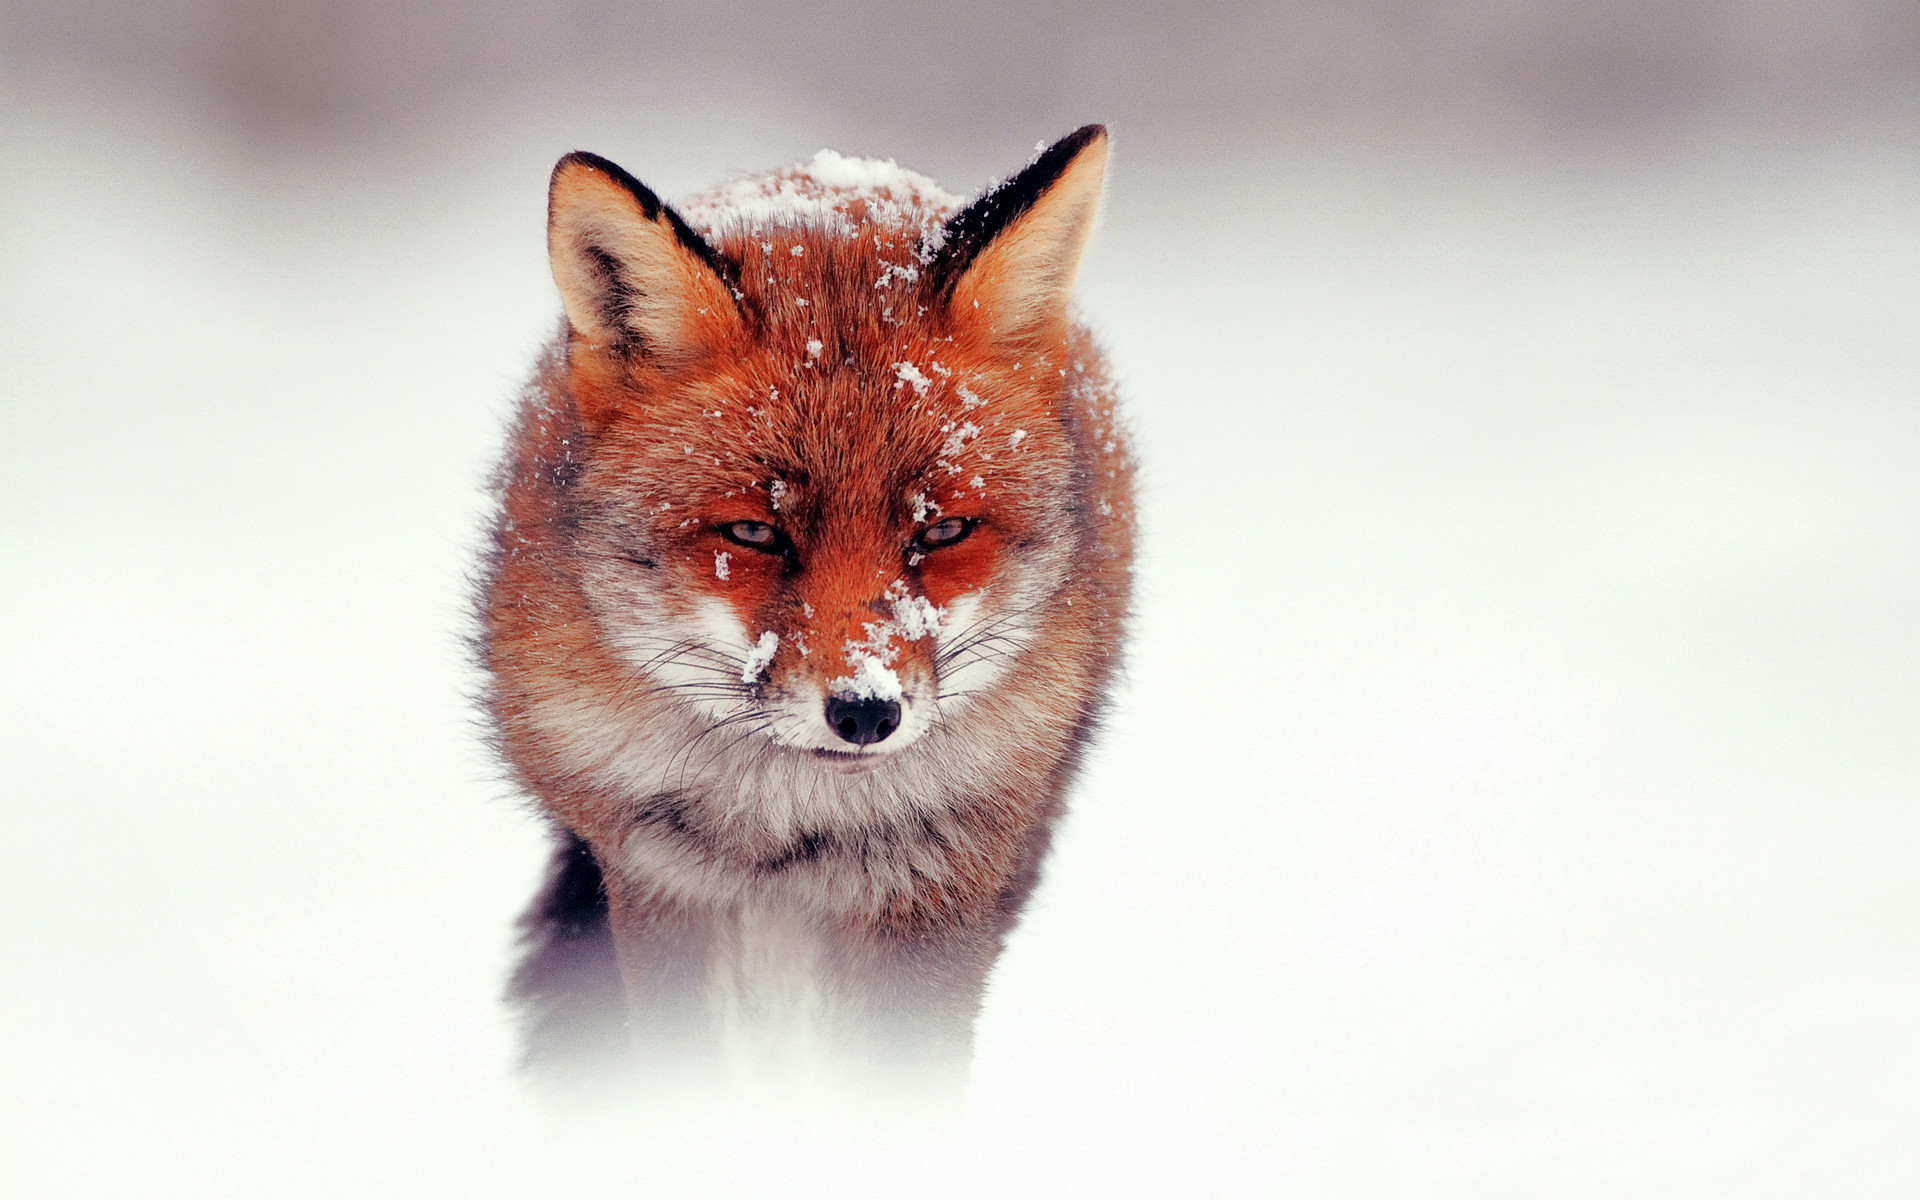 Red Fox Wallpaper Wide